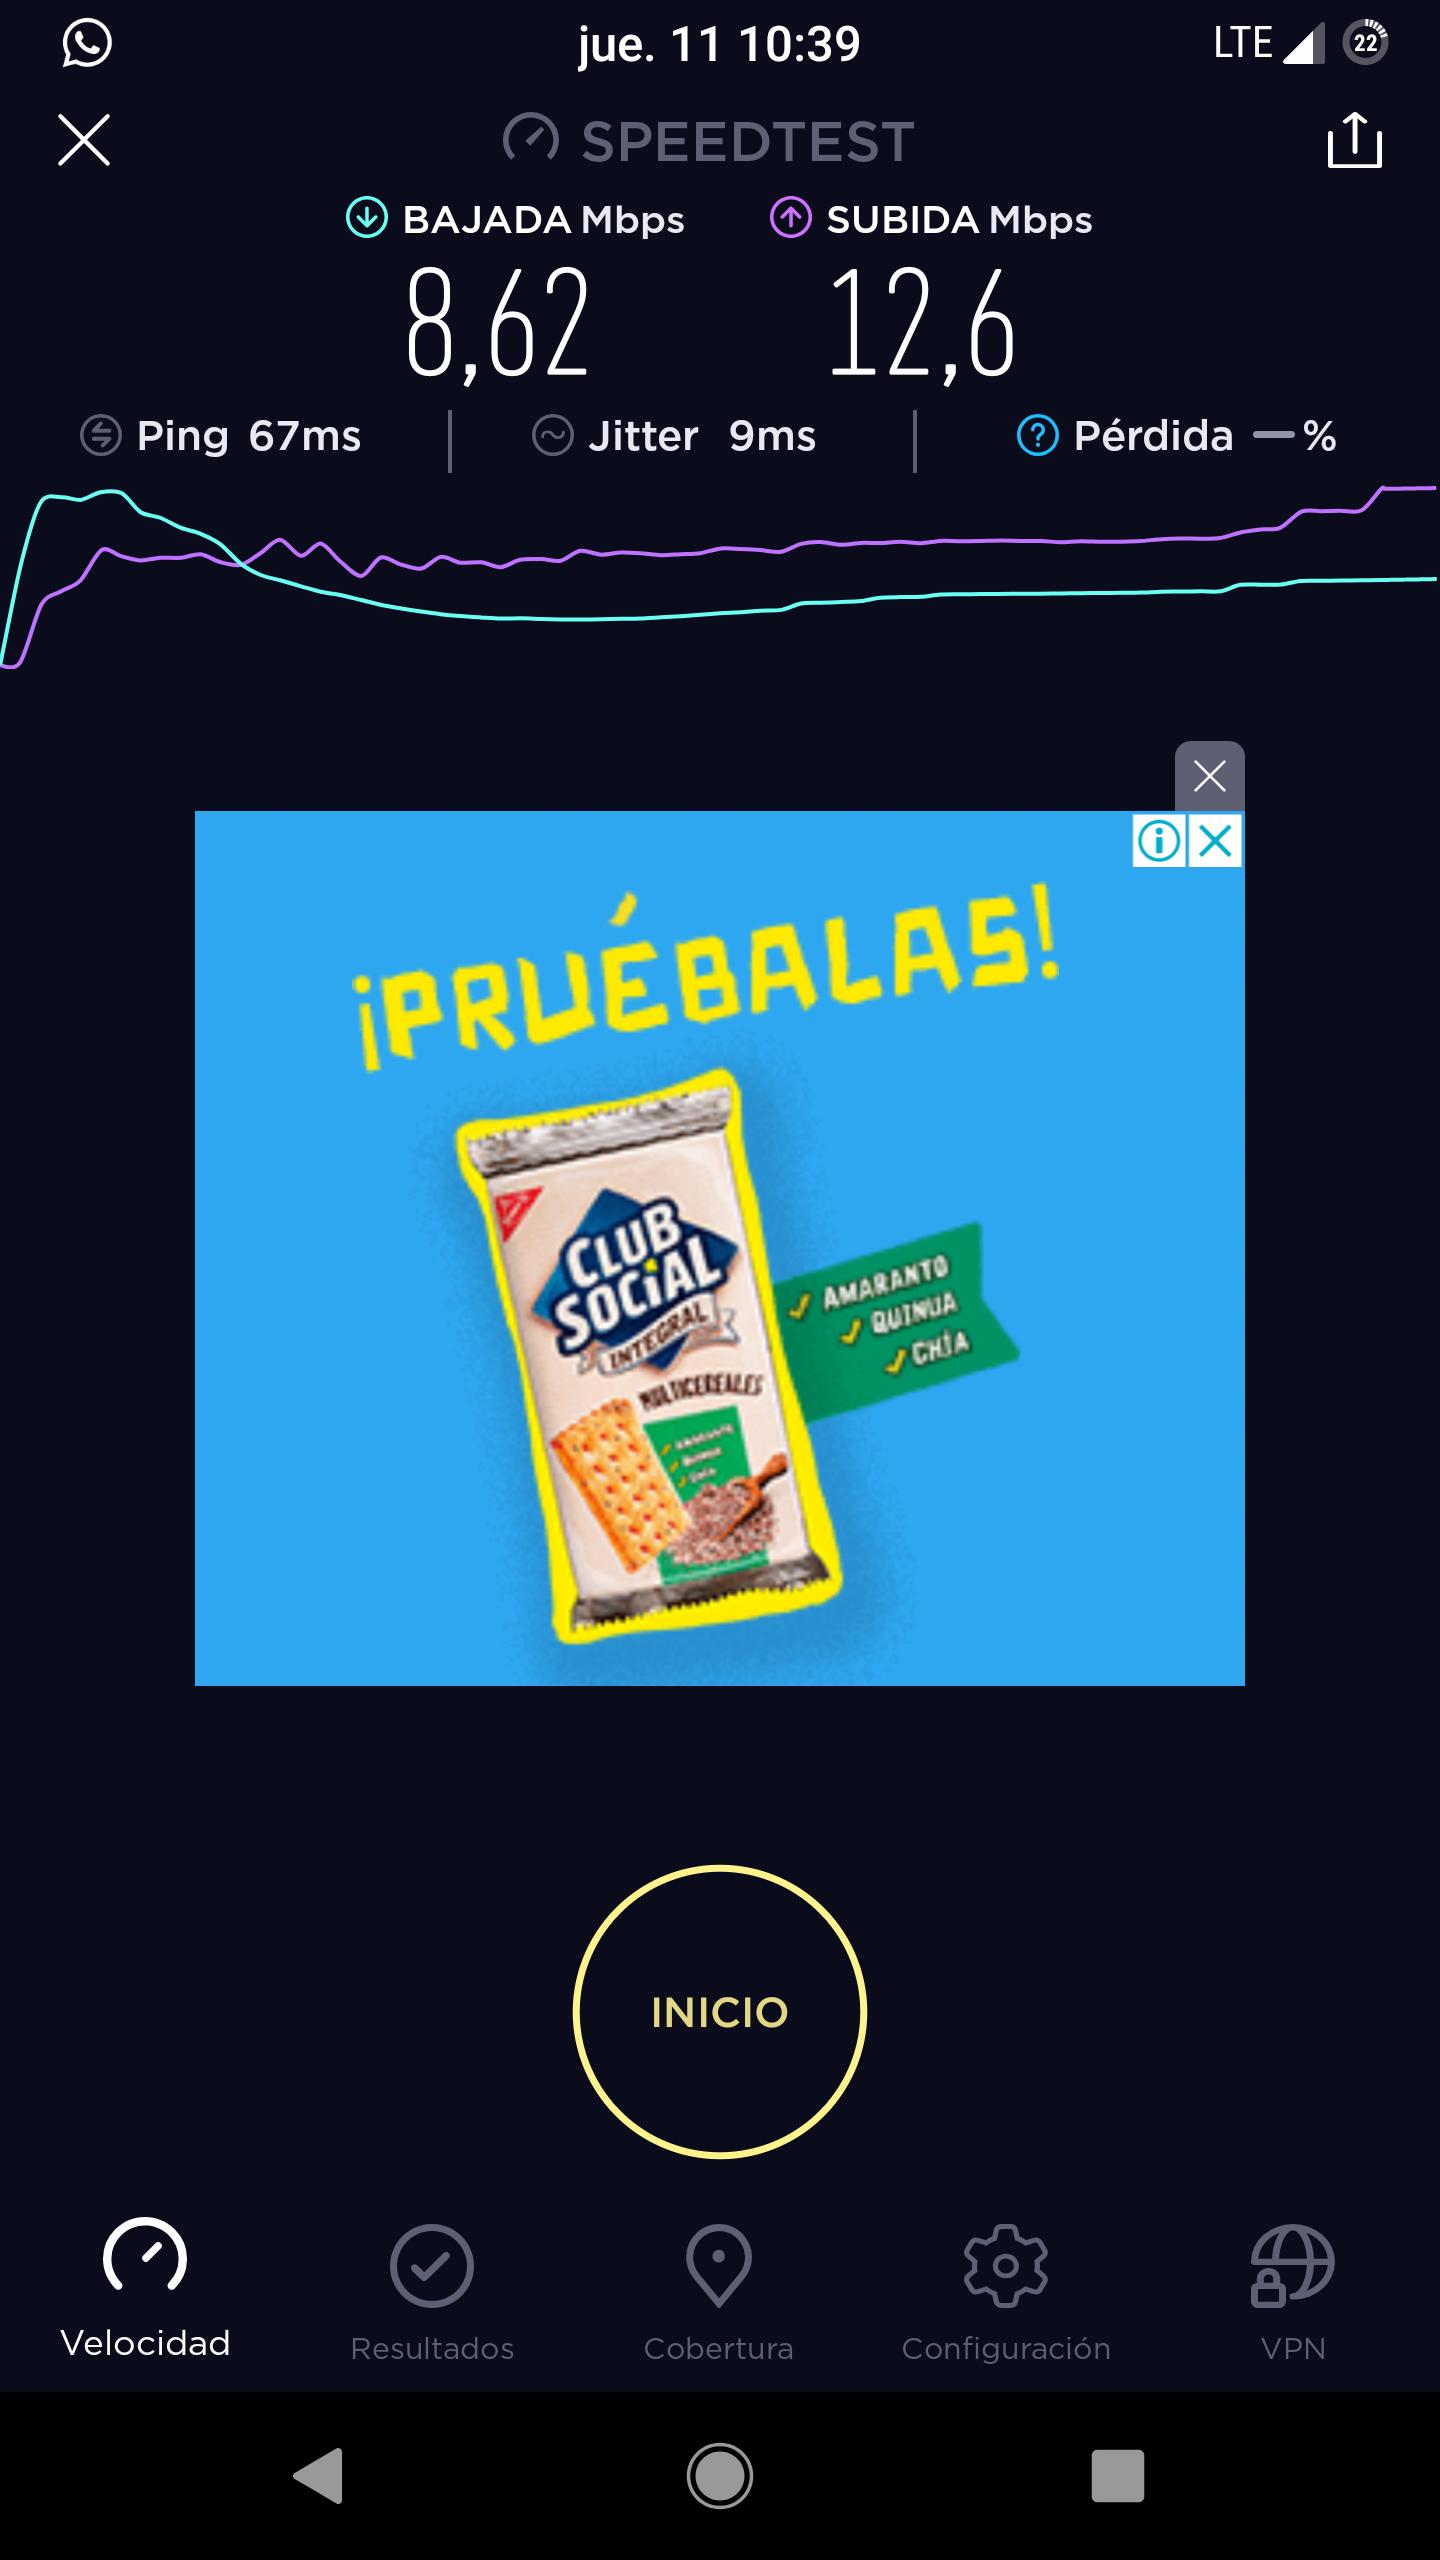 Screenshot_Speedtest_20181011-103934.png